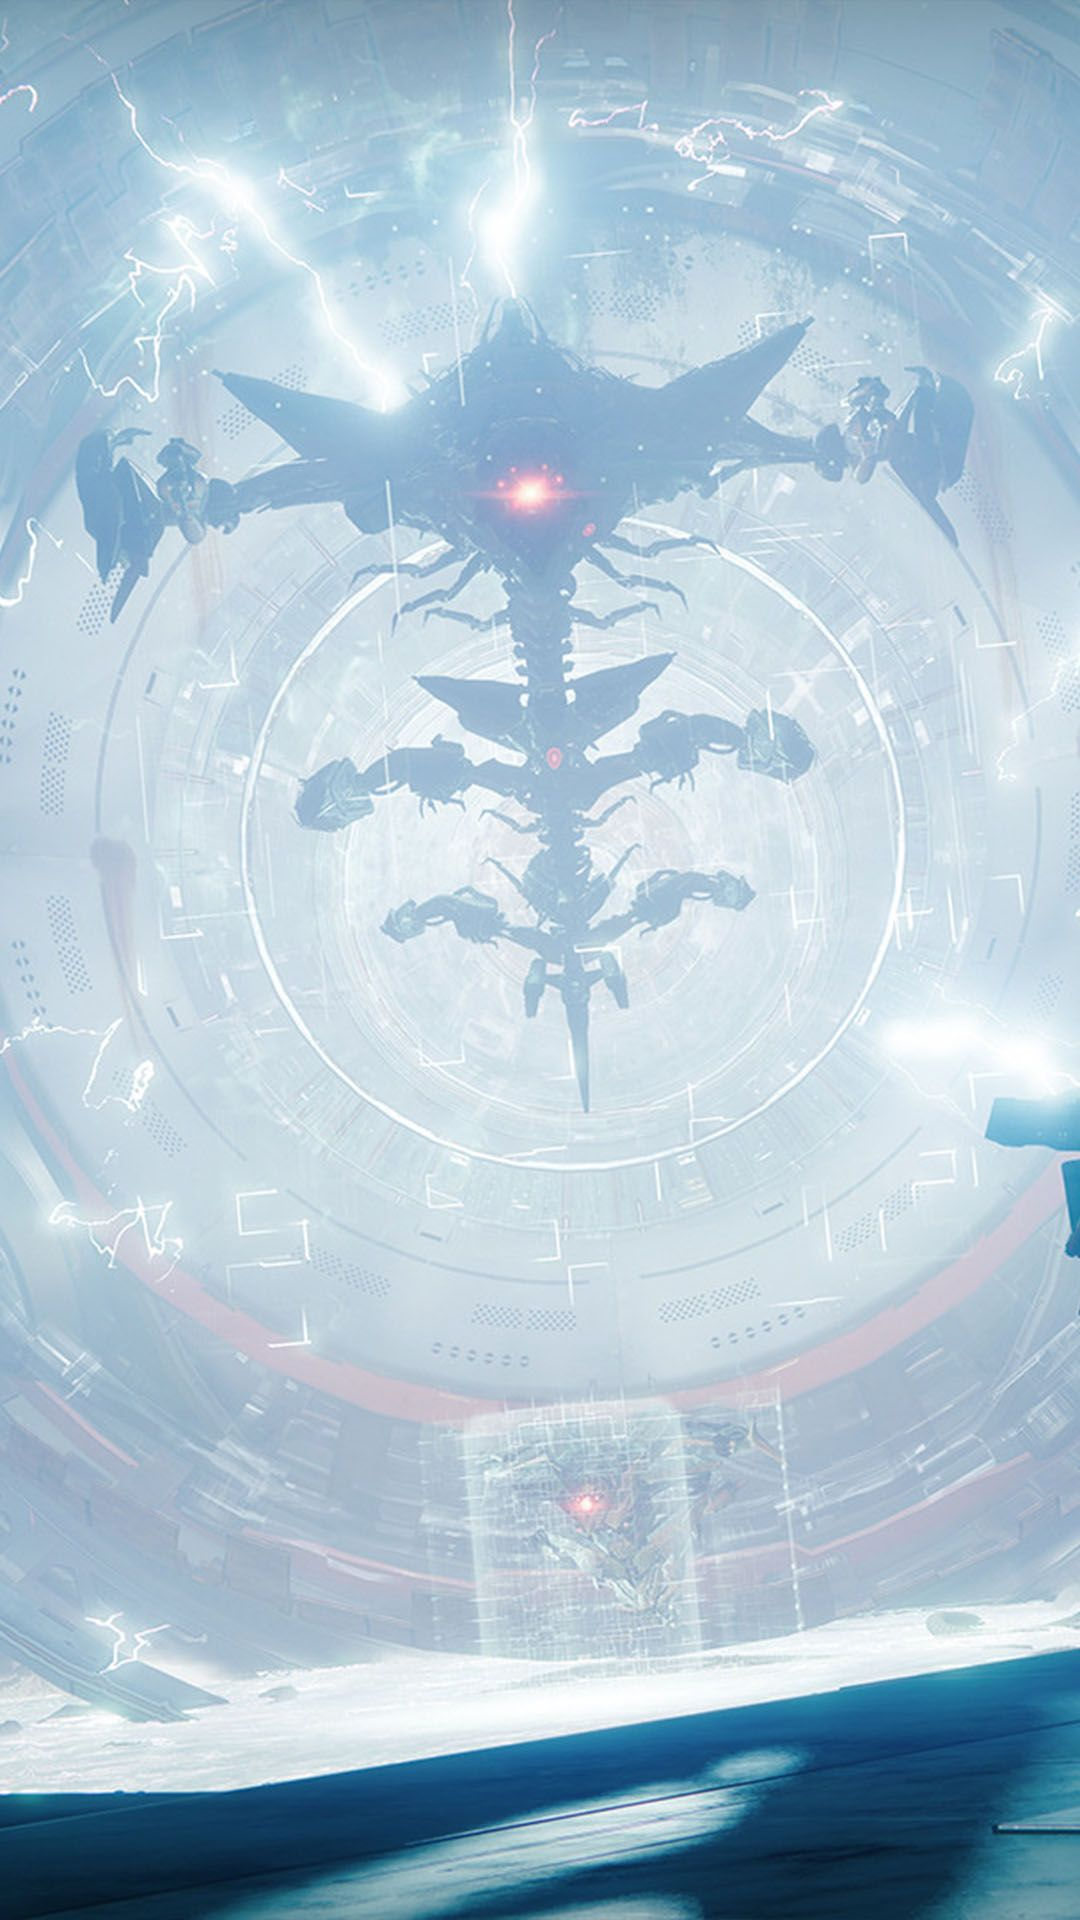 Destiny 2 Beyond Light 2020 New 4k Ultra Hd Mobile Wallpaper Wallpaper Destiny 2 Beyond Light Wallpaper Destiny 2 Beyond Light